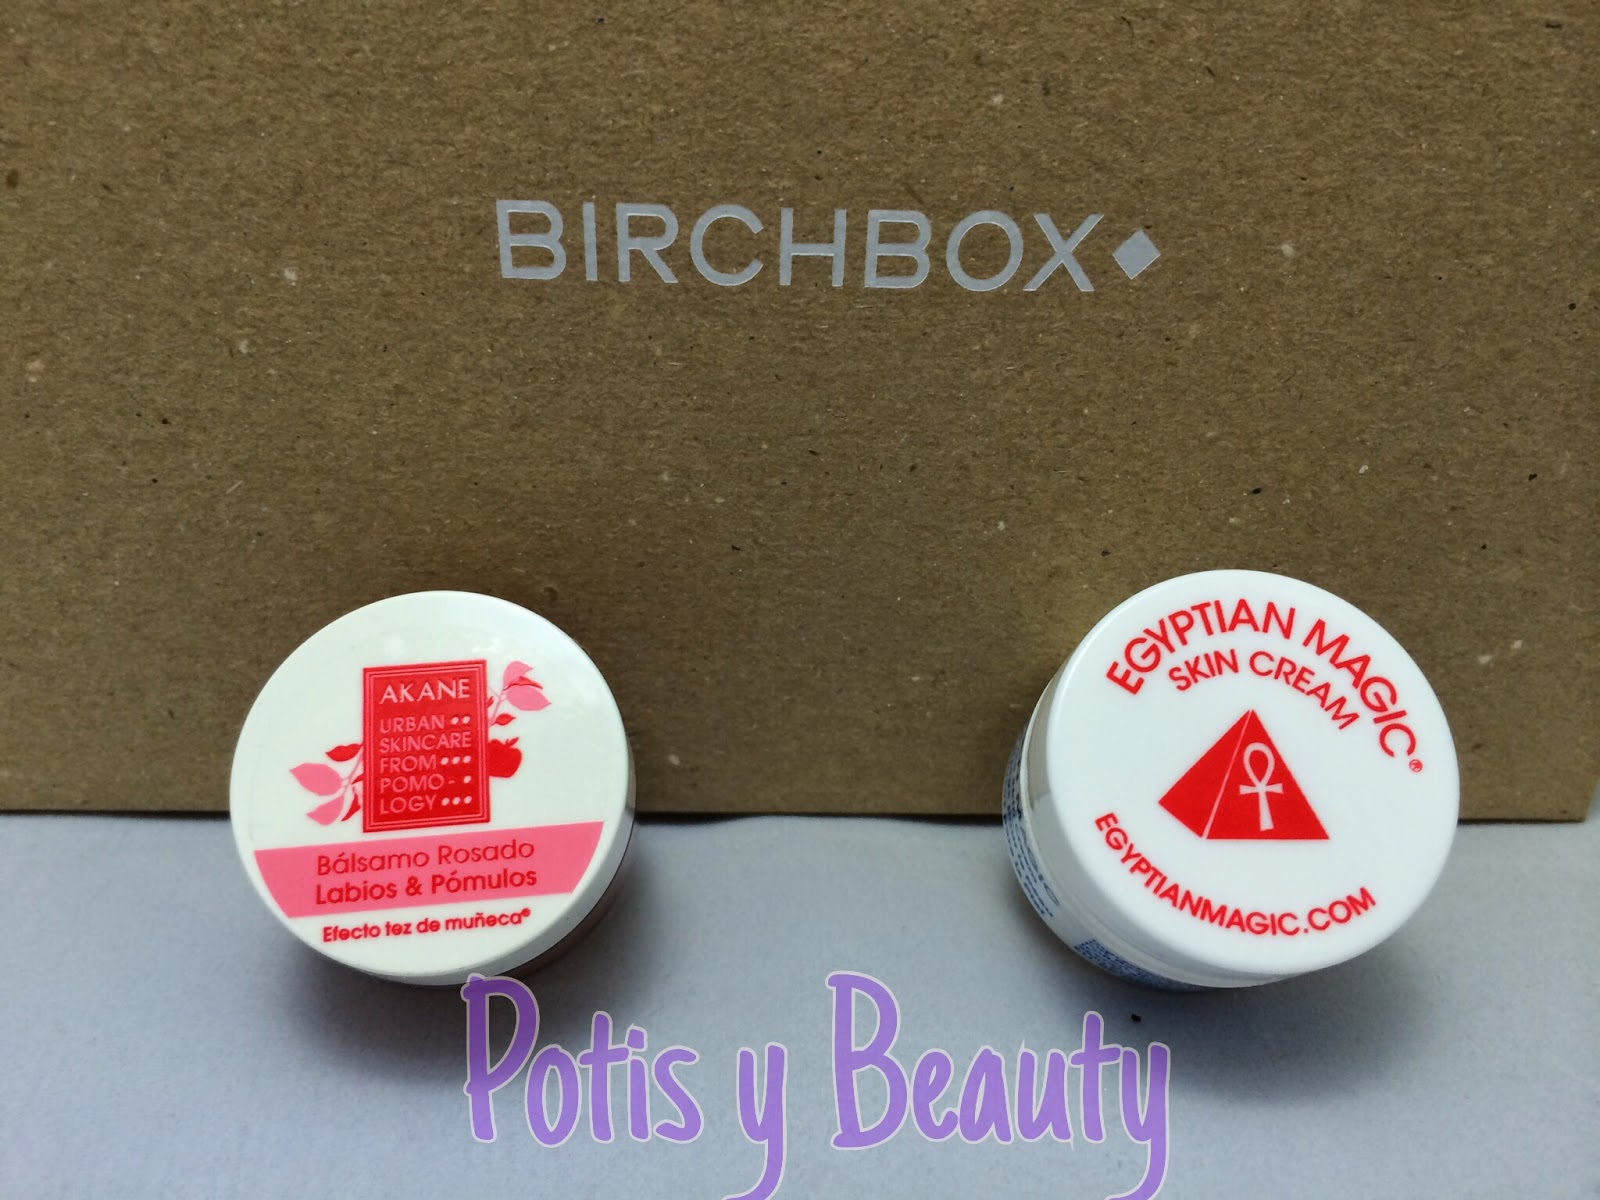 Birchbox Mayo 2014